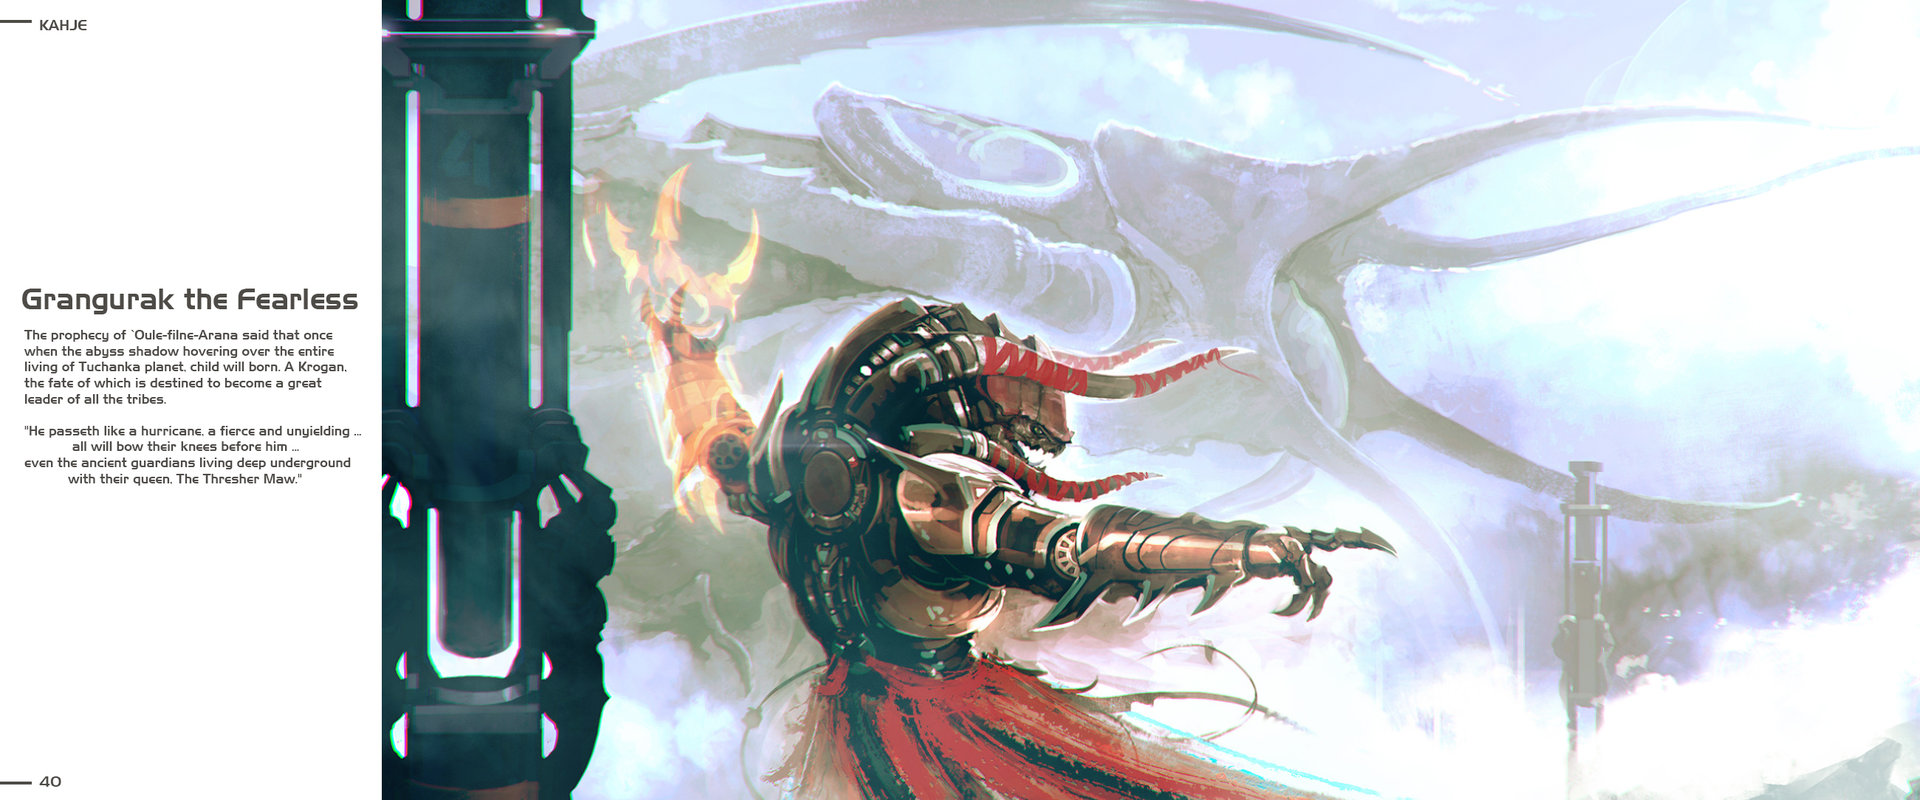 Artemy maslov battle master2k noframe update